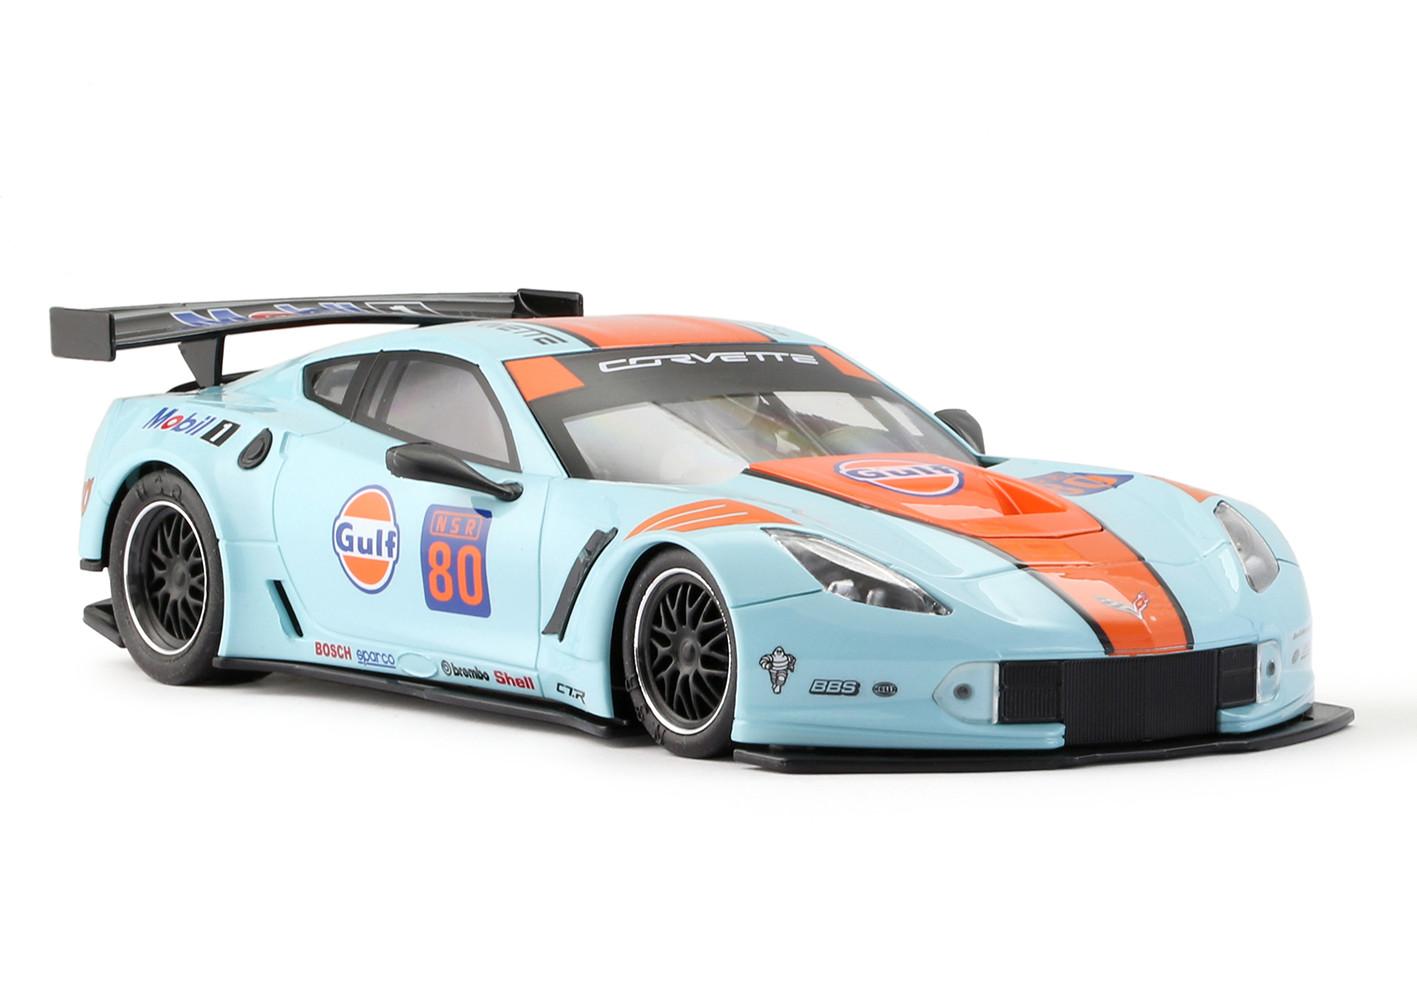 NSR - Corvette C7R #80, Gulf Edition - Chassi Verde: 0068AWG